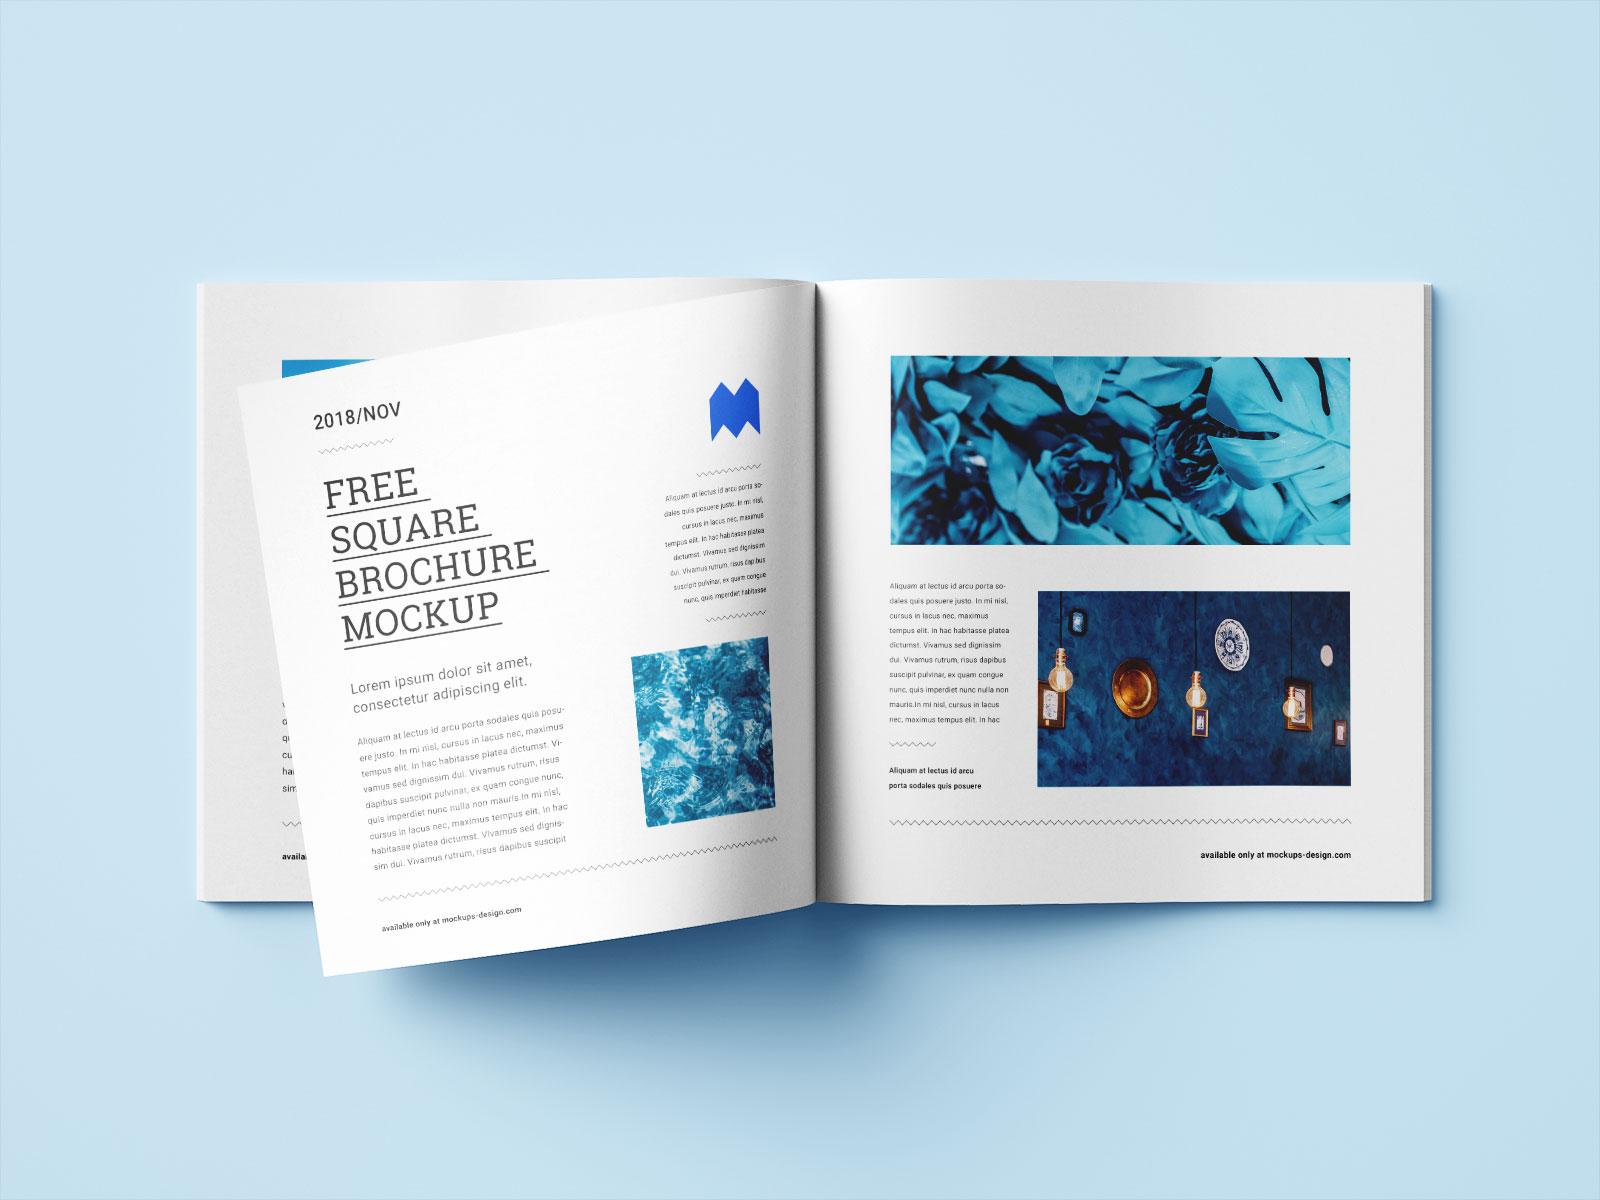 Free_Square_Brochure_Magazine_Mockup_PSD-Set (5)